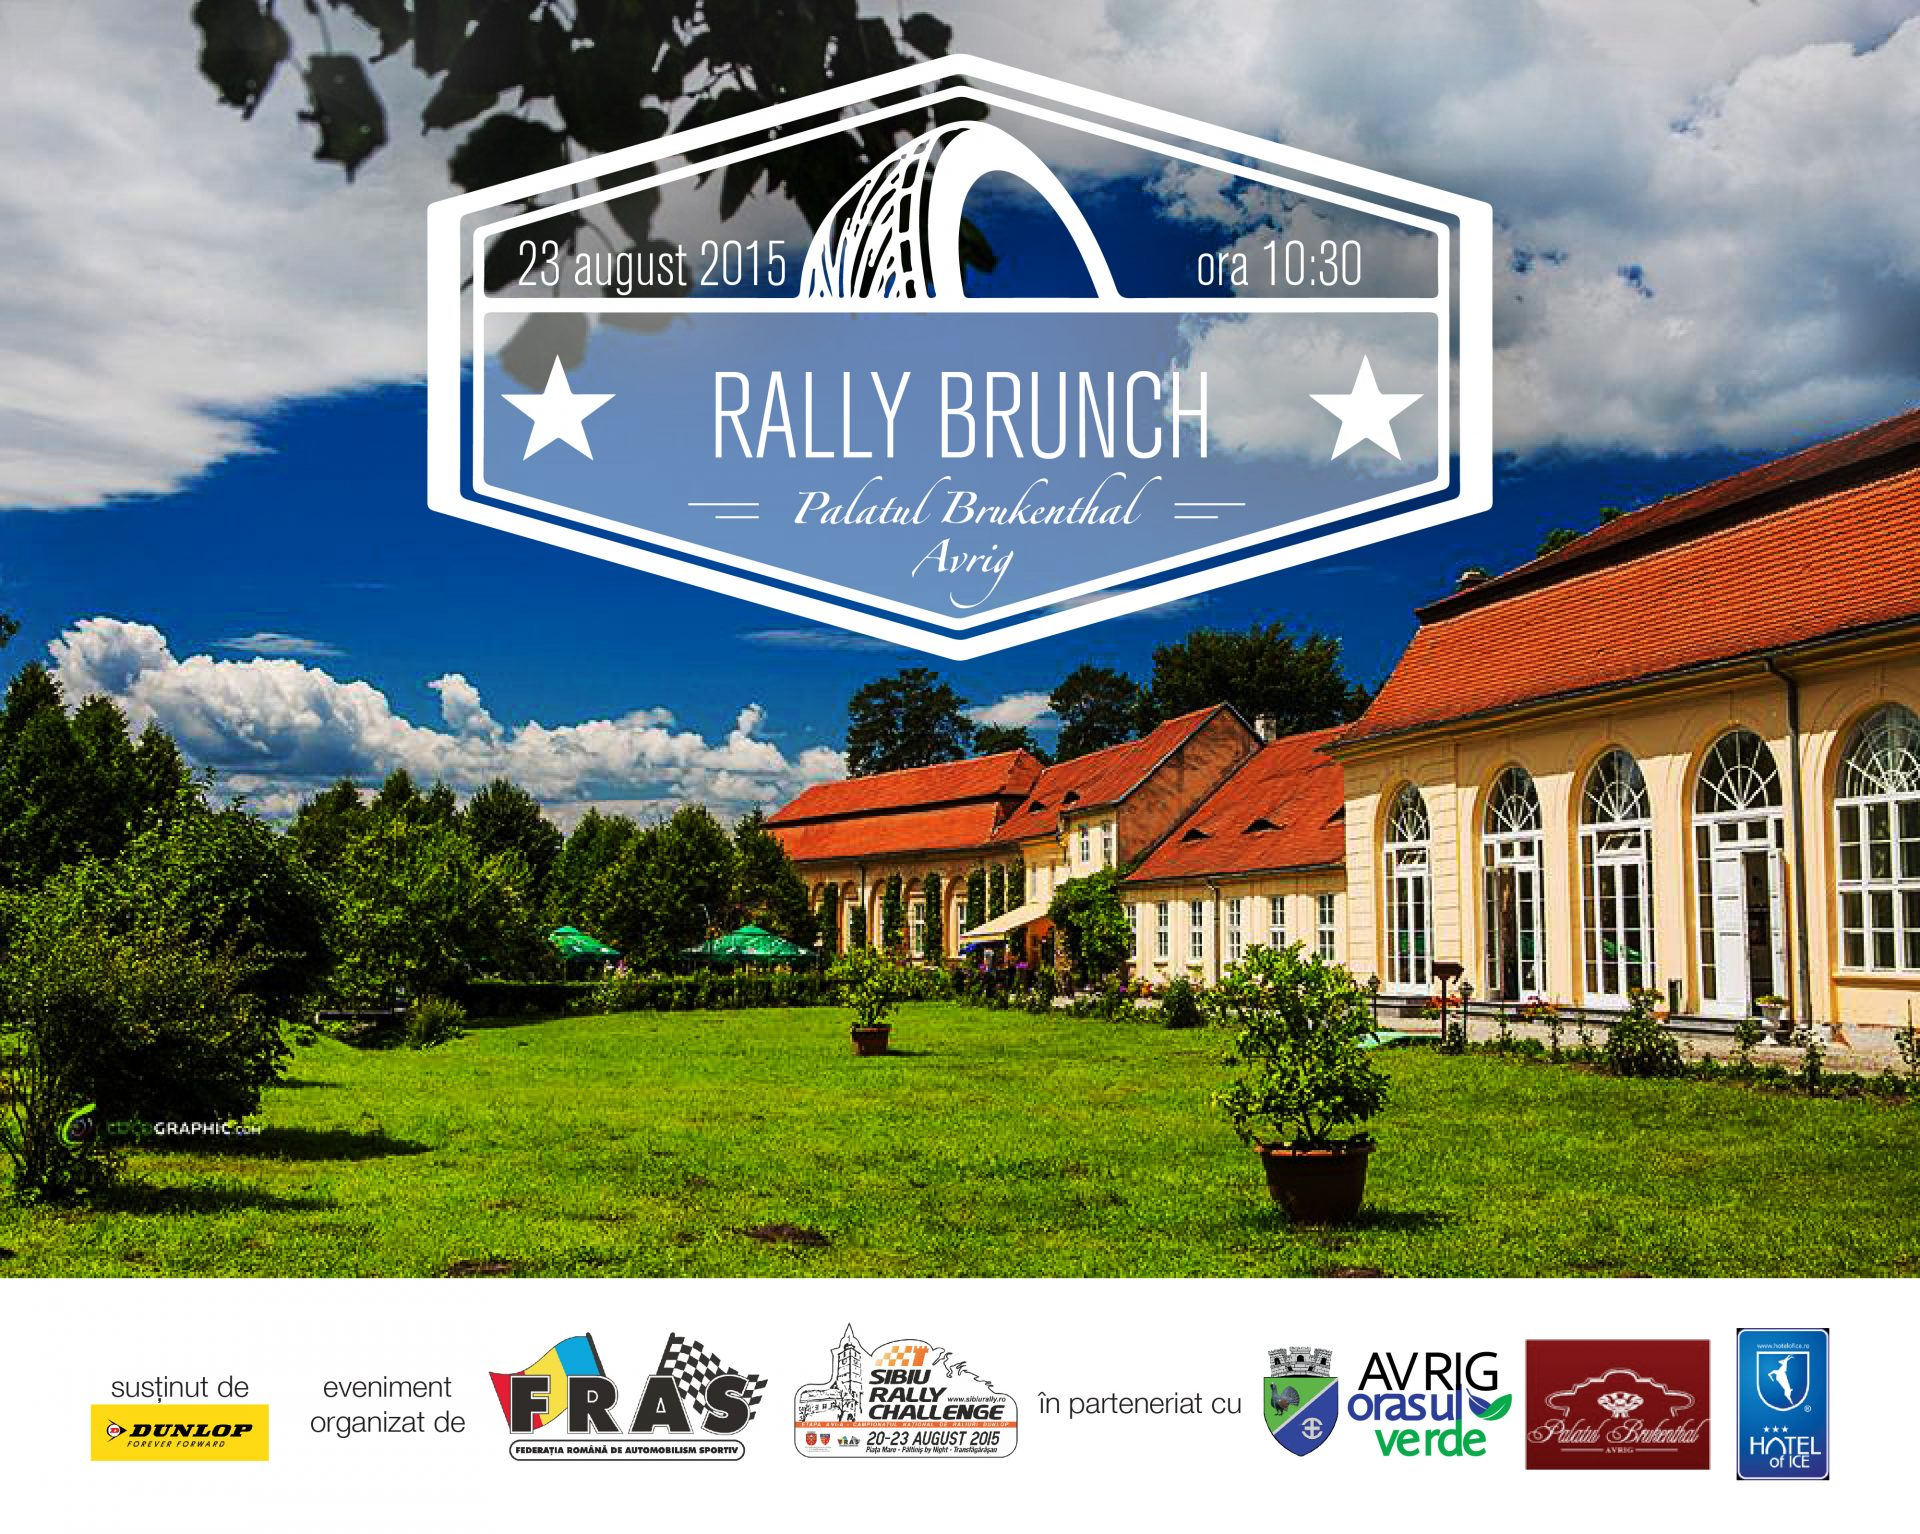 Rally Brunch la Palatul Bruckenthal, Avrig